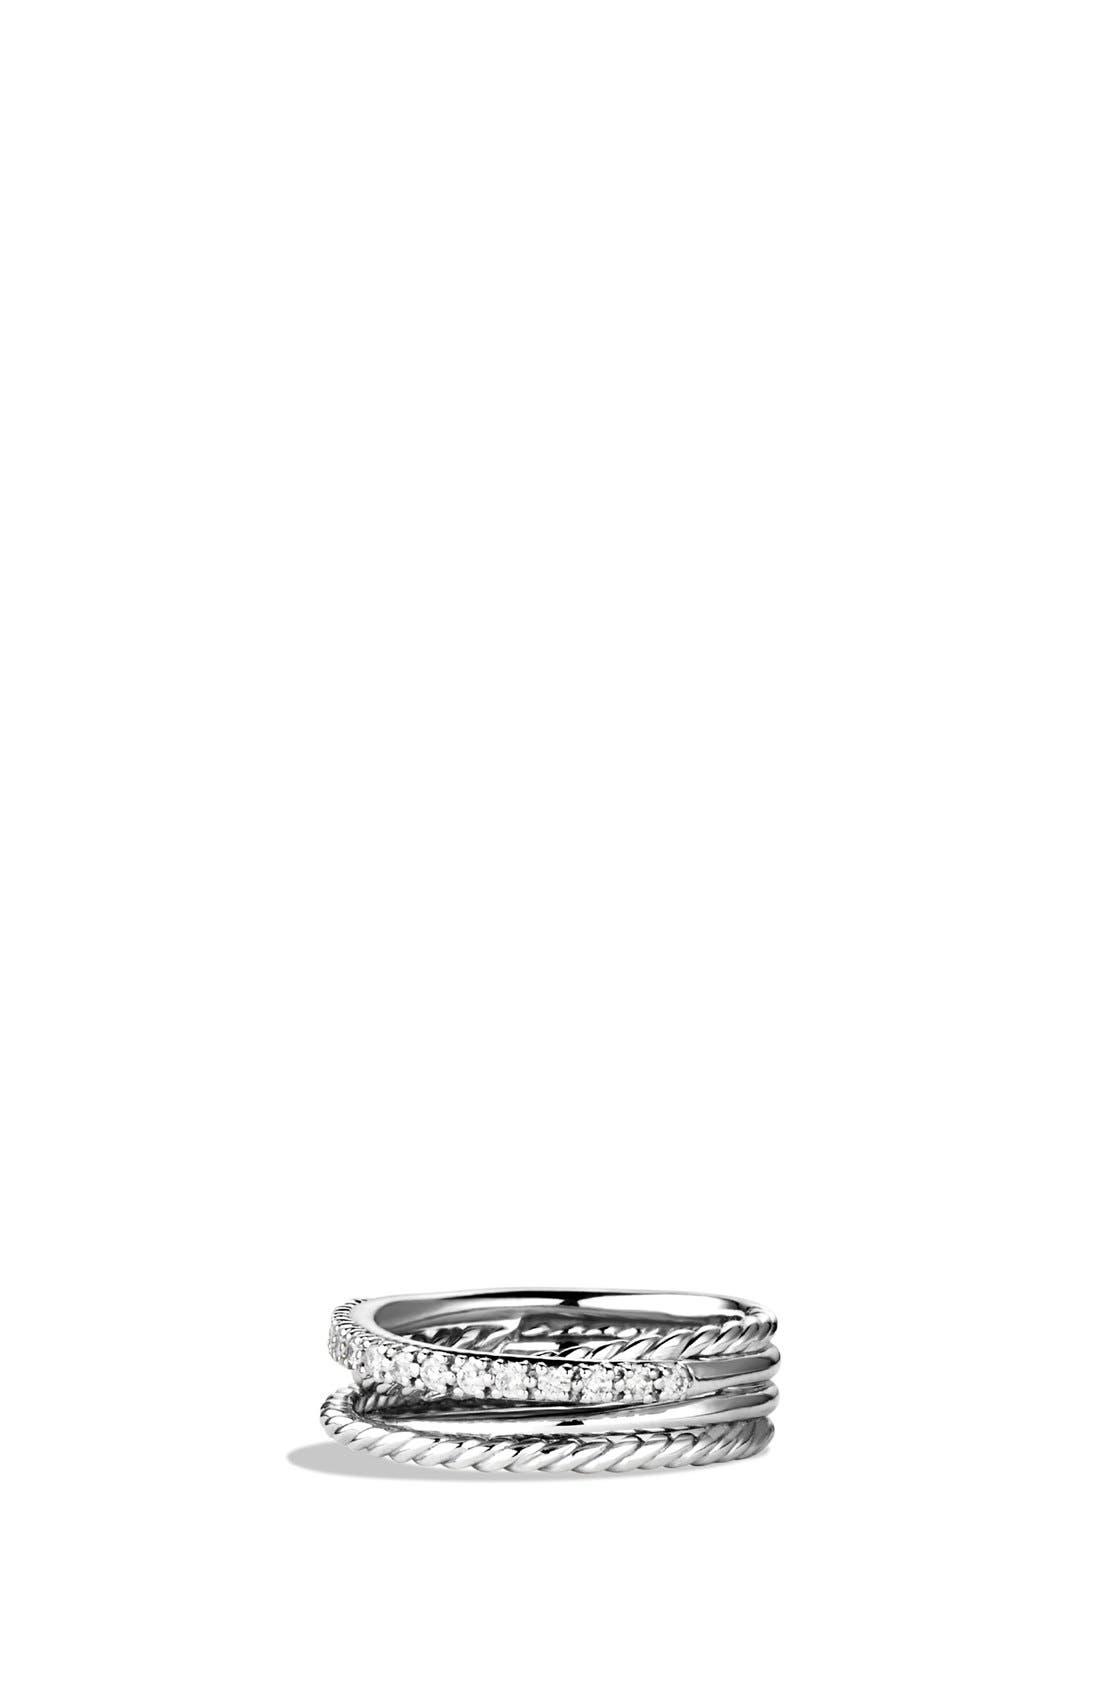 Main Image - David Yurman 'Crossover' Ring with Diamonds